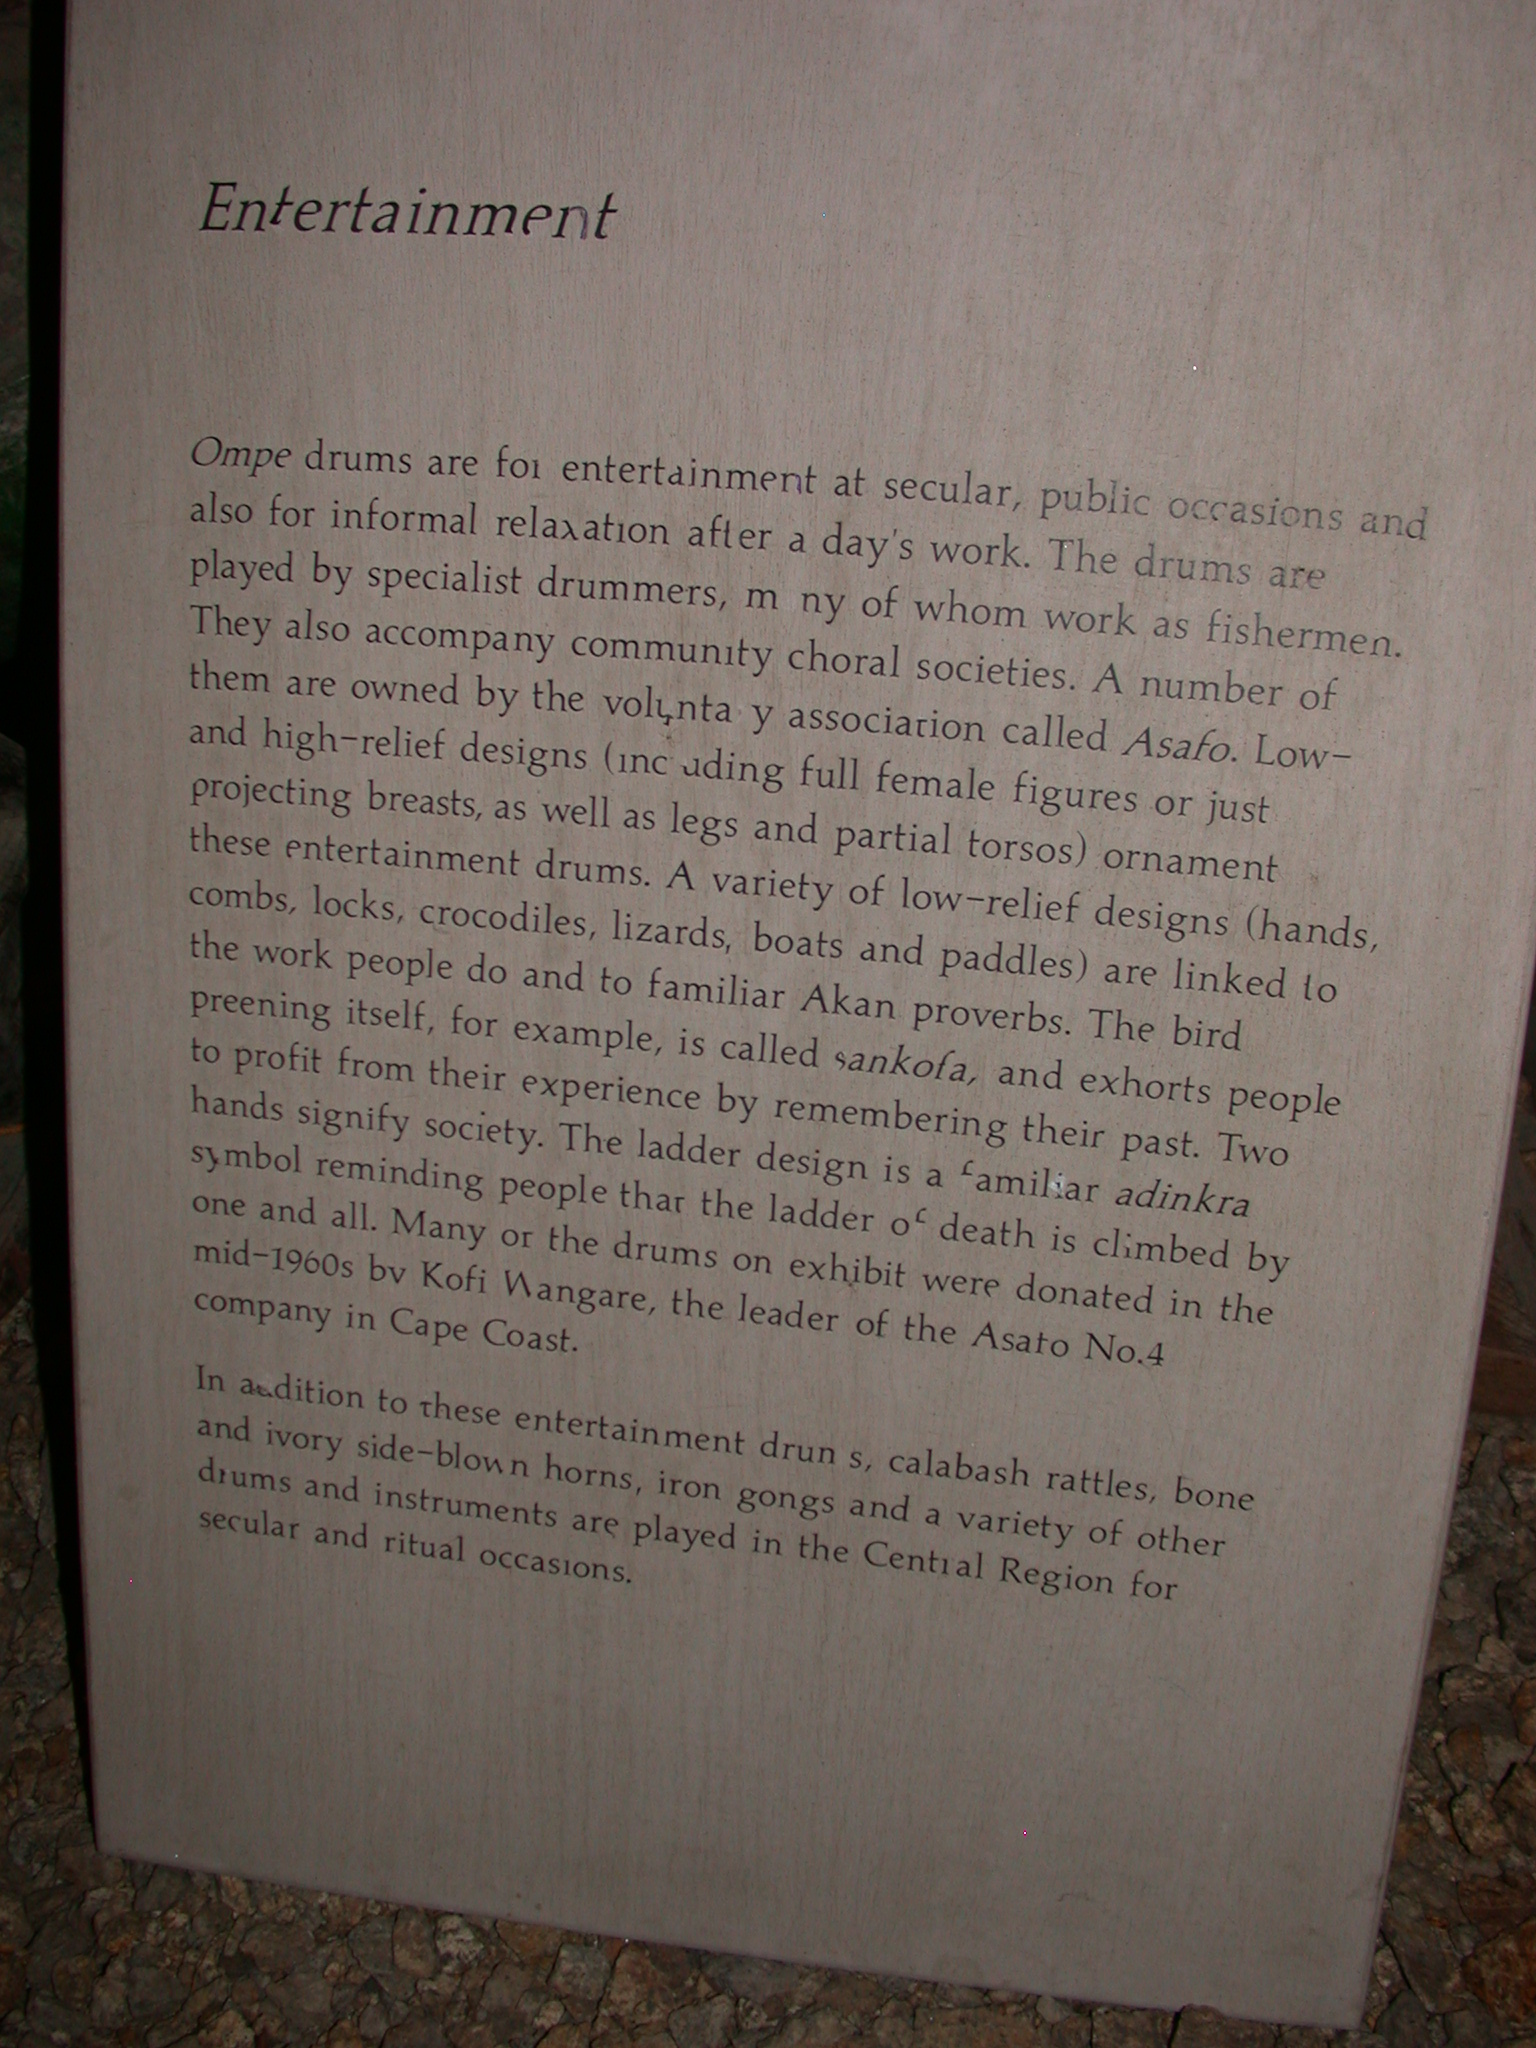 Akan Entertainment Description, Cape Coast Slave Fort Museum, Cape Coast, Ghana